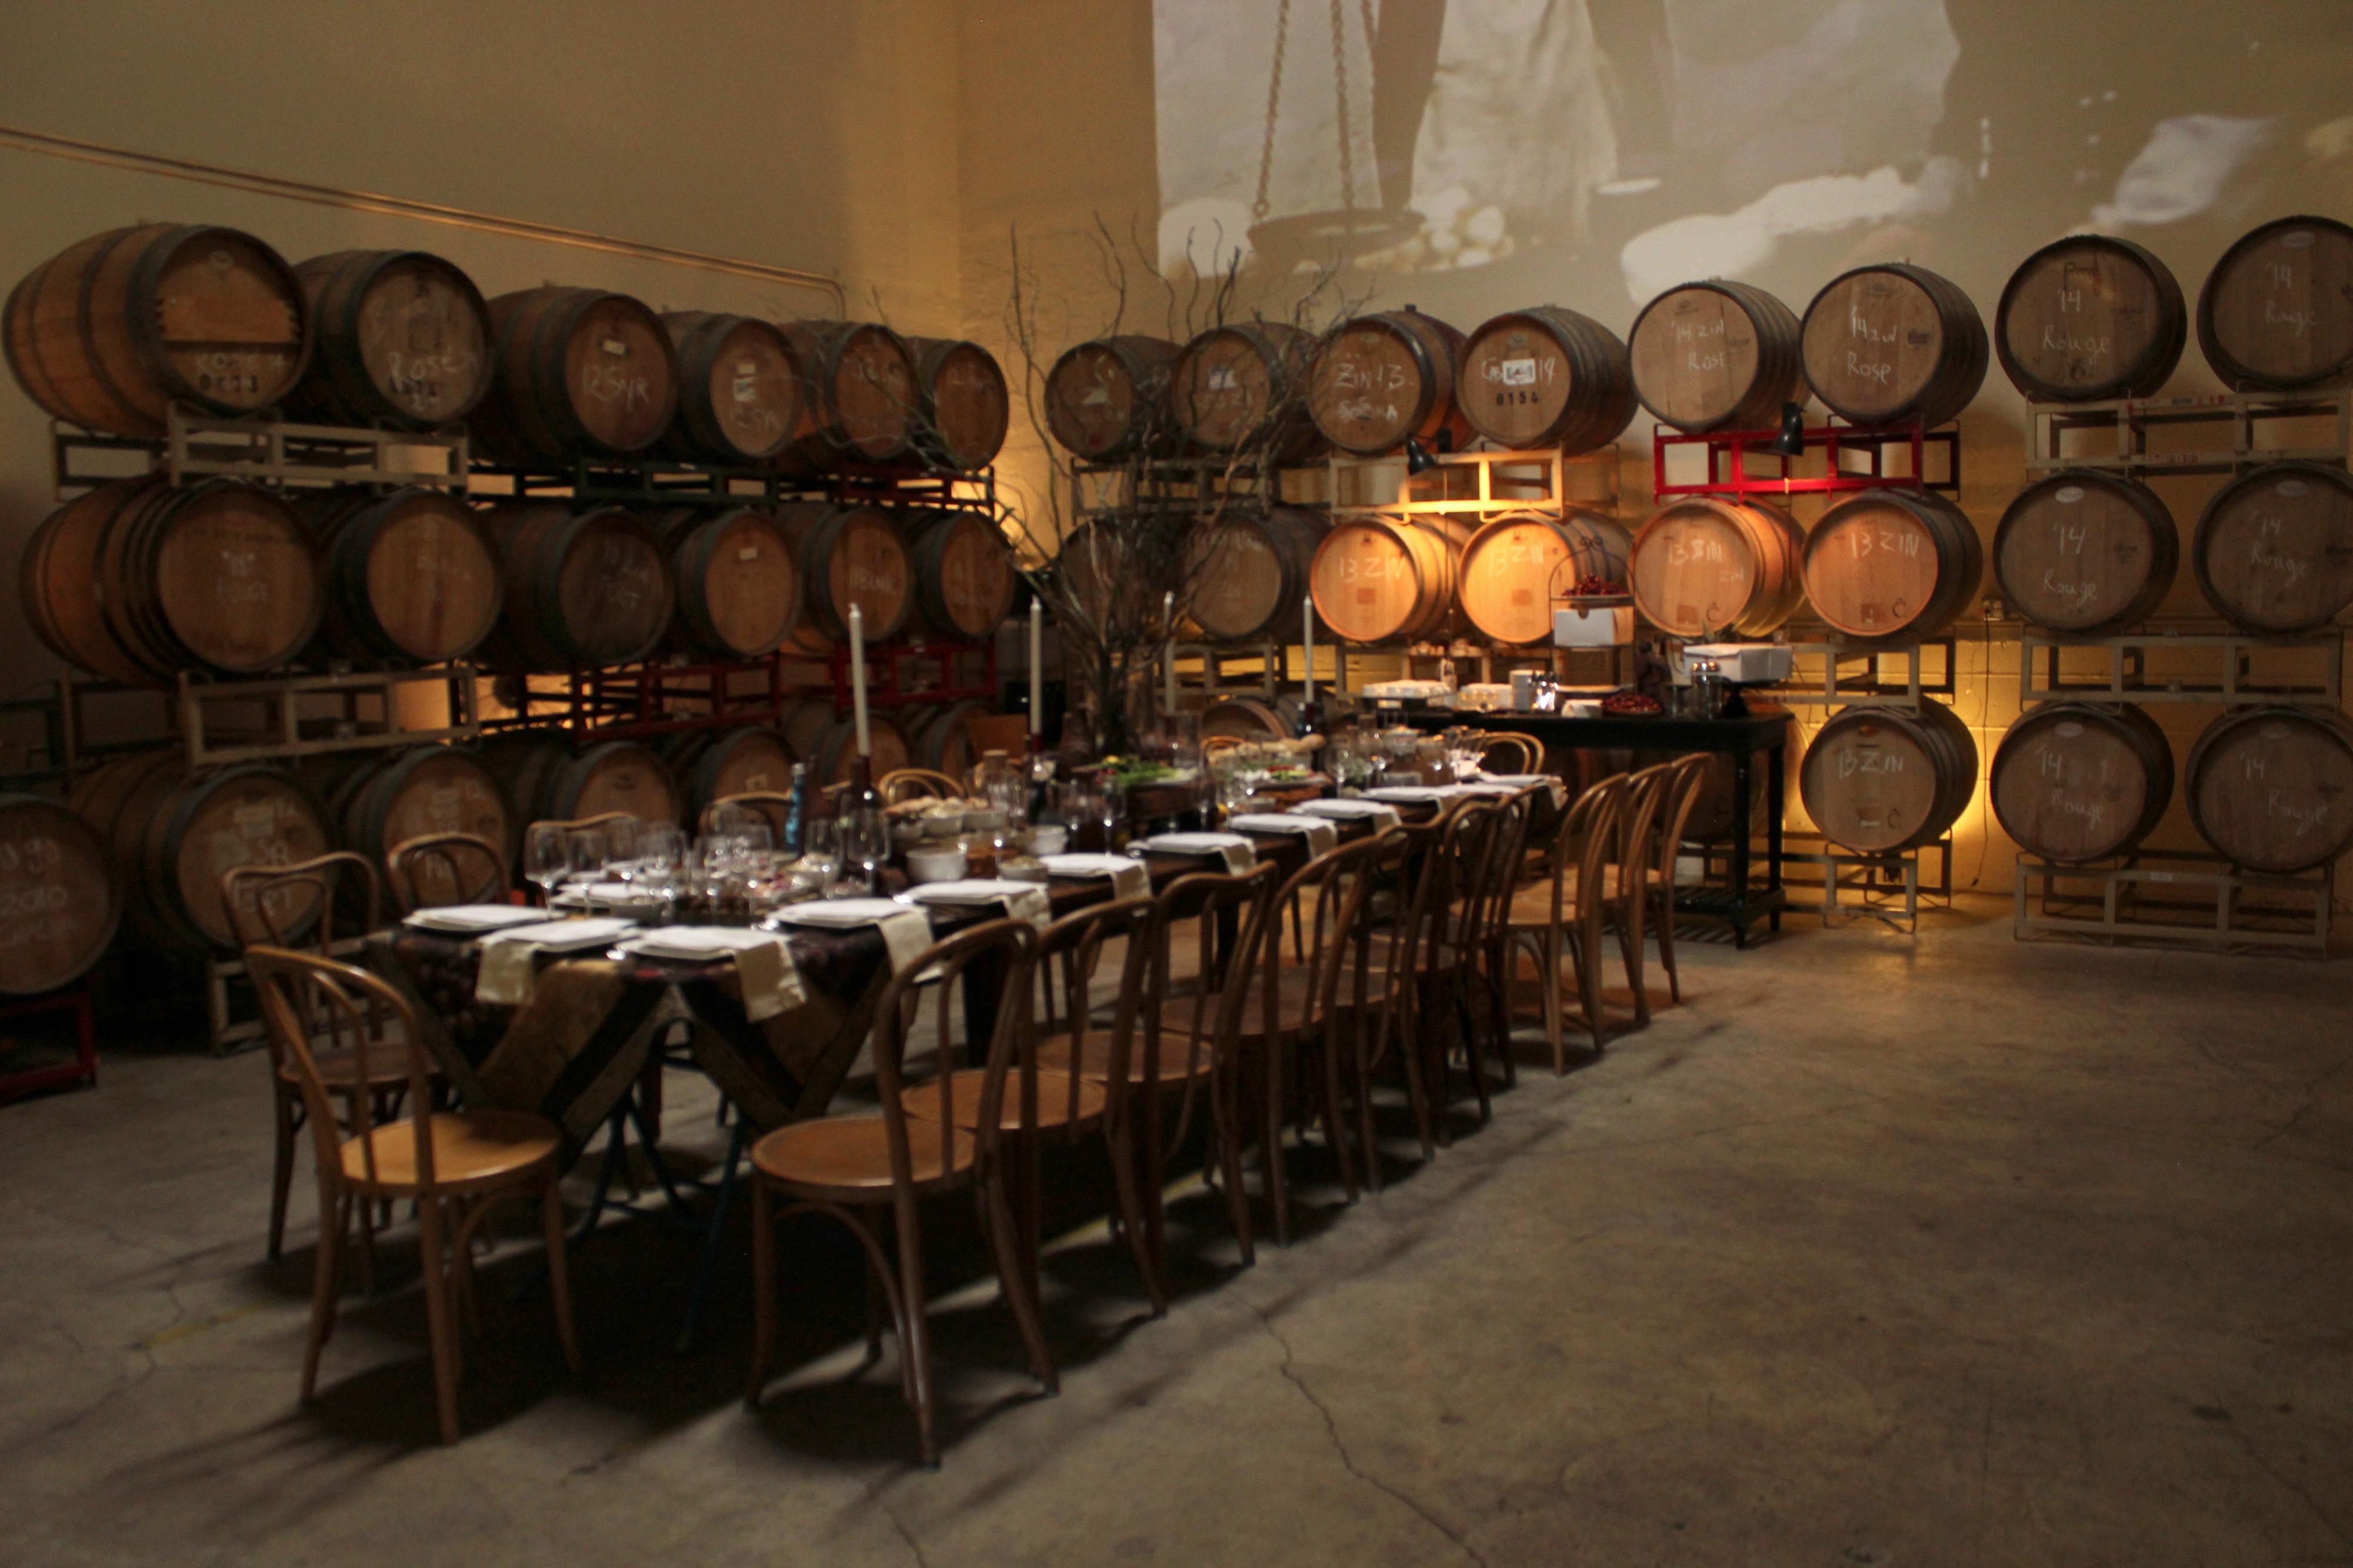 Urban Winery | Tasting Room | Barrel Room, San Francisco, CA | Event ...